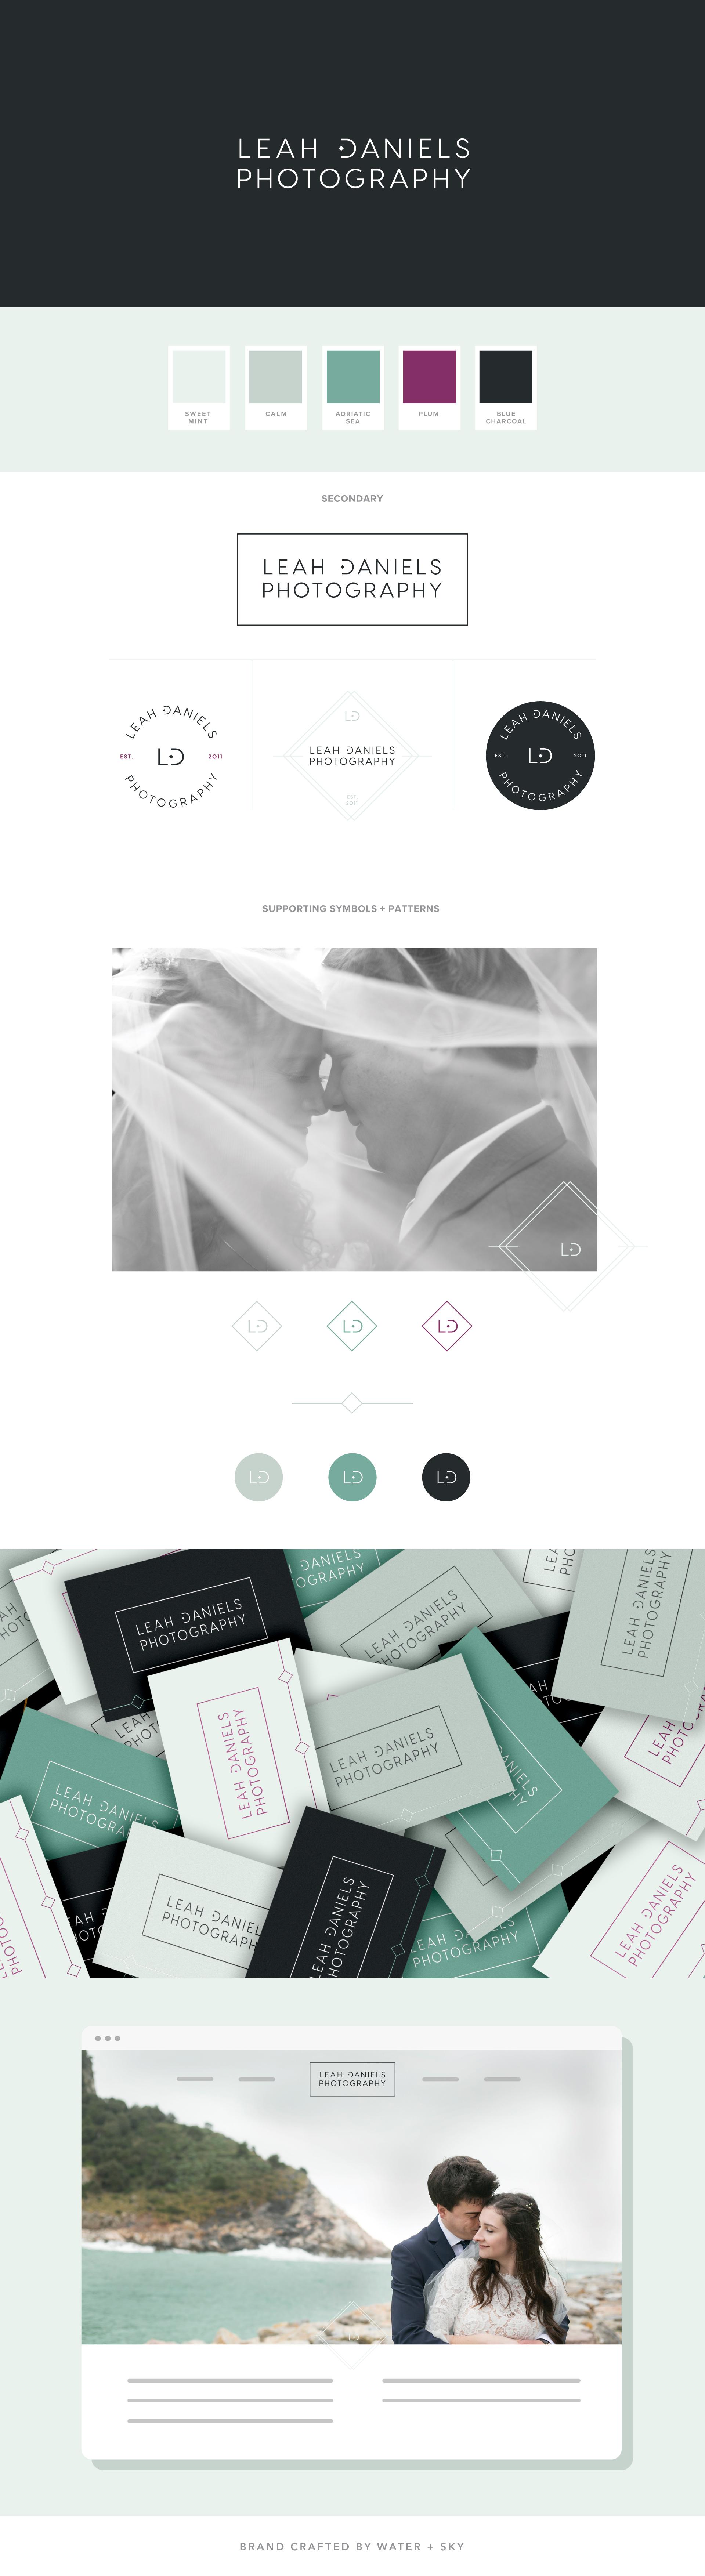 Leah-Daniels-Photography-Brand-Board-Website-Water+Sky-Brand-Studio.jpg